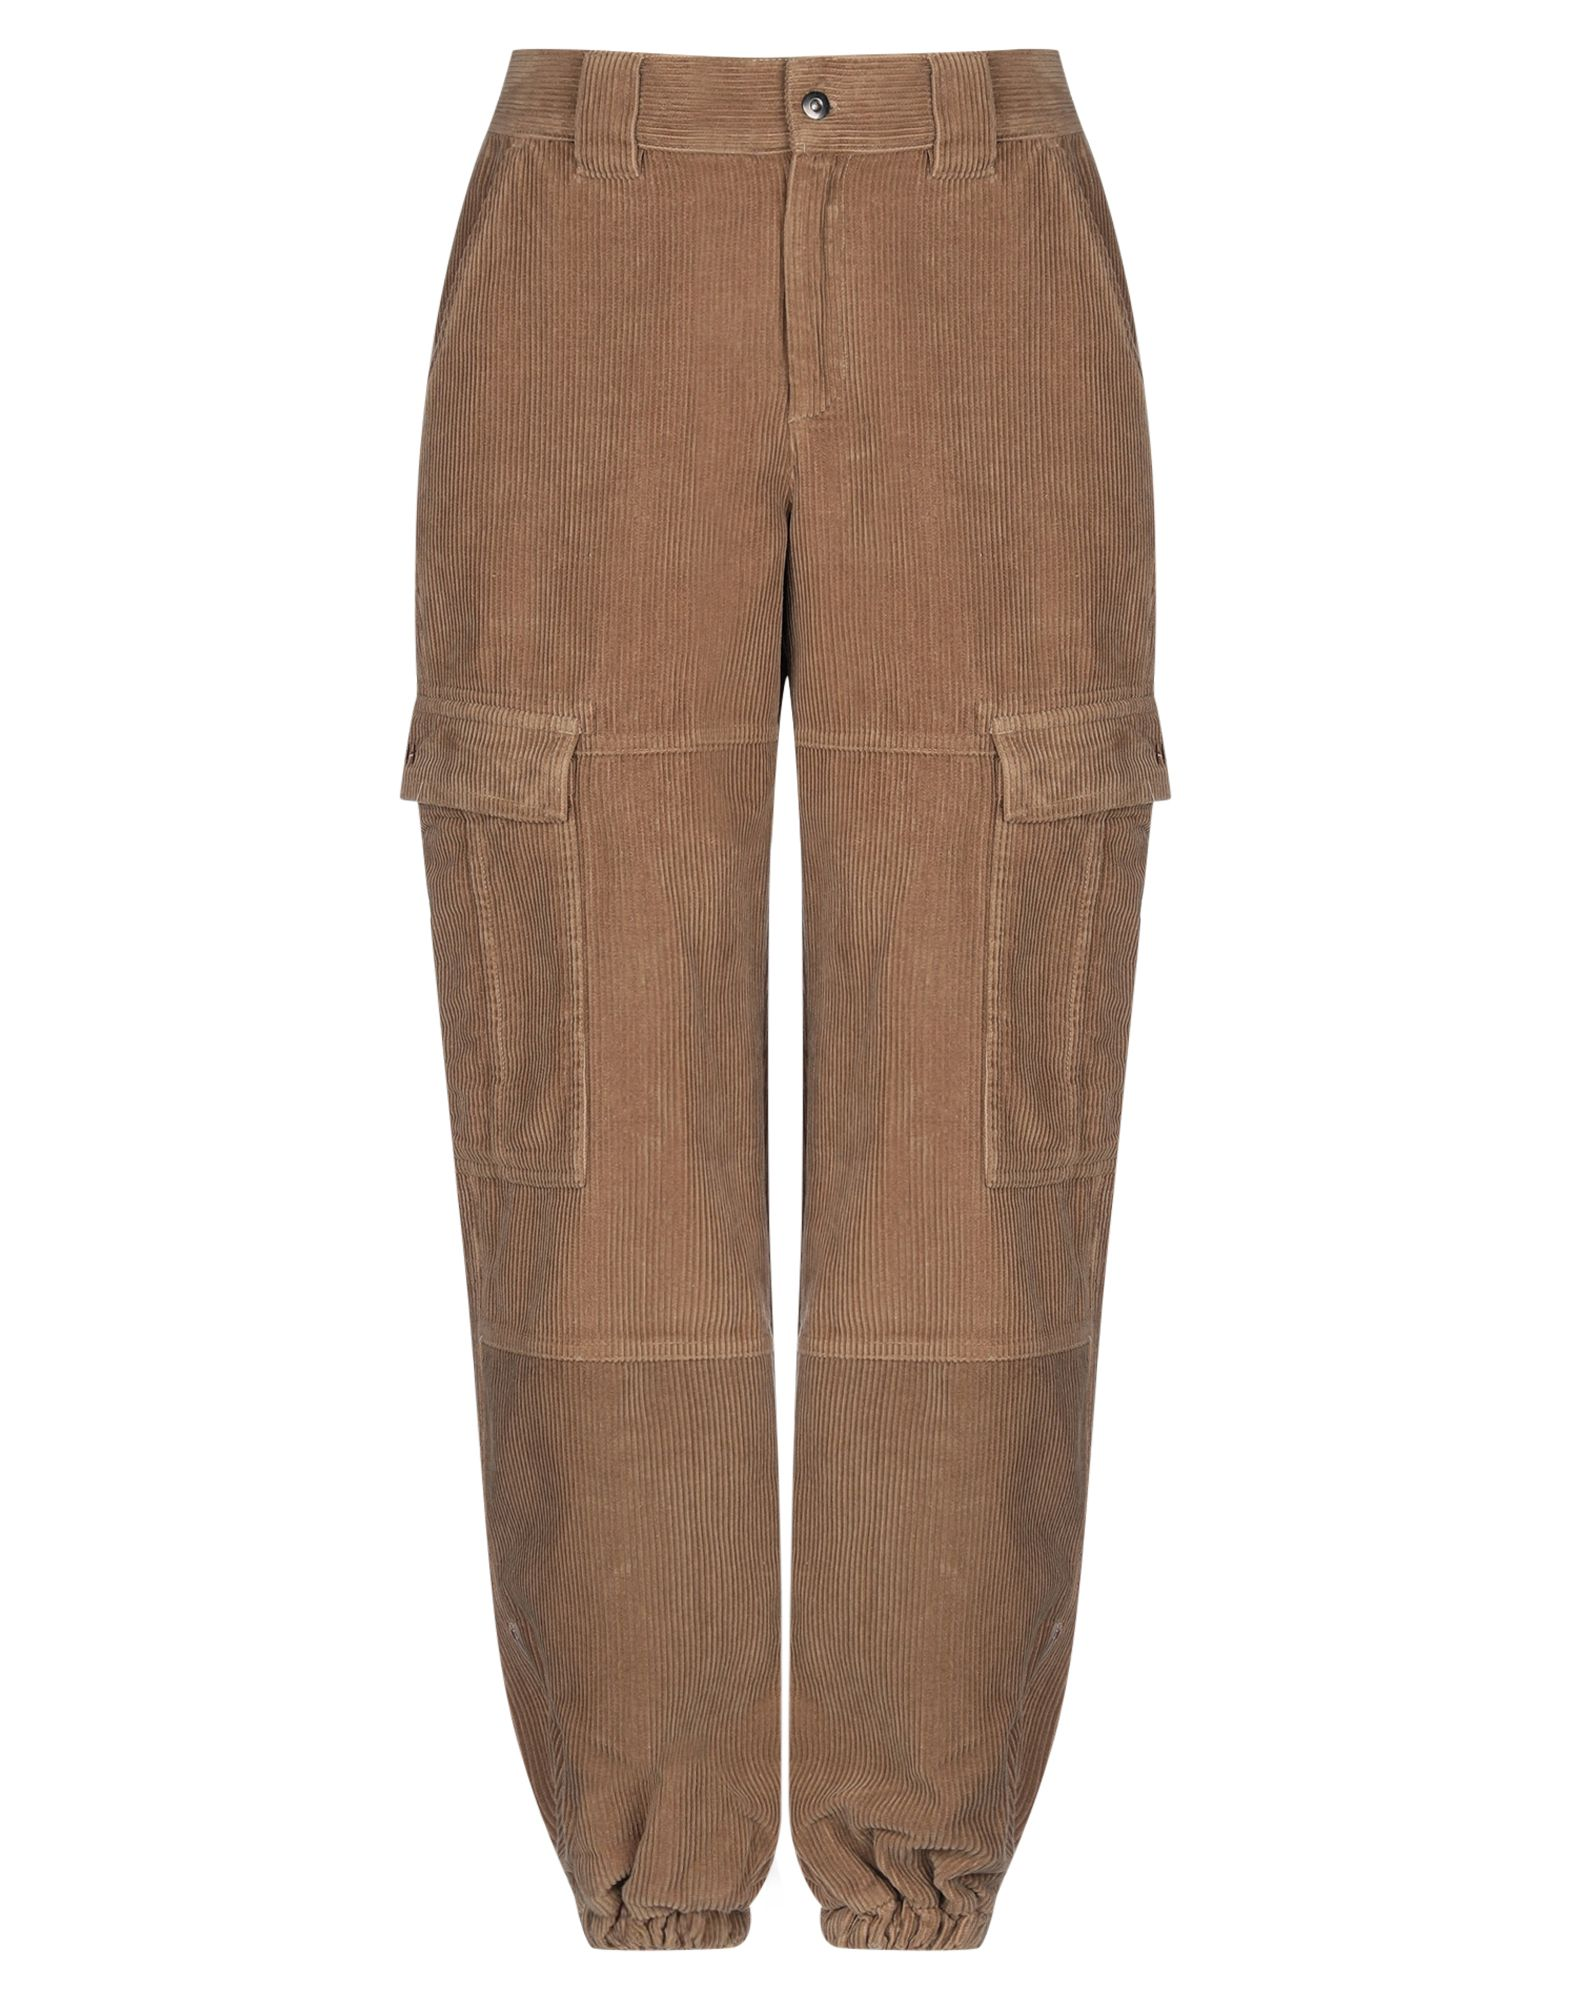 H2OFAGERHOLT Casual pants. velvet, ribbed, basic solid color, logo, high waisted, regular fit, tapered leg, button, zip, multipockets, zips at hem. 100% Cotton